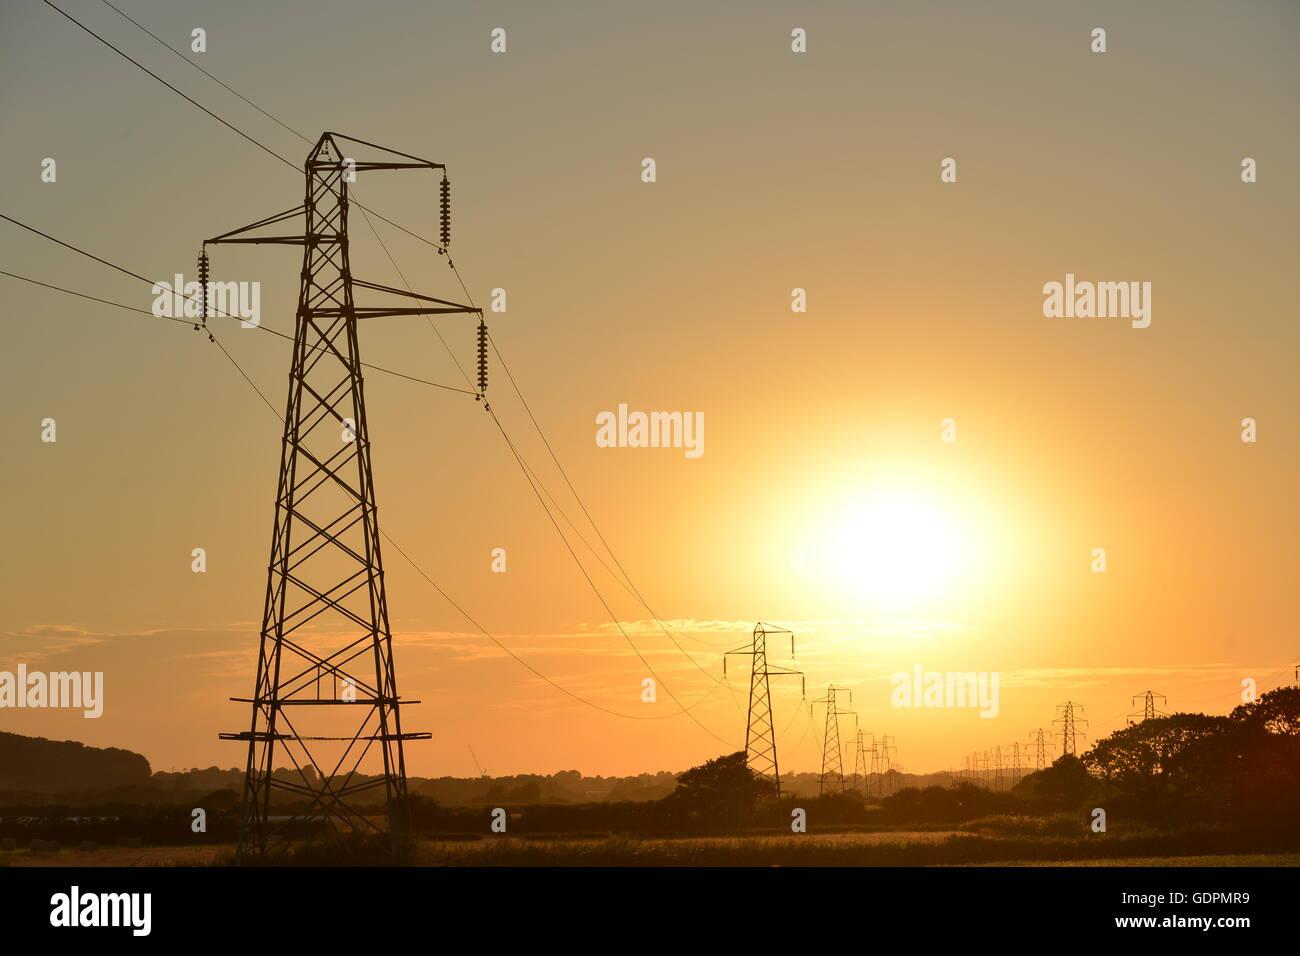 Sonnenuntergang hinter Strom Stromleitungen Stockbild